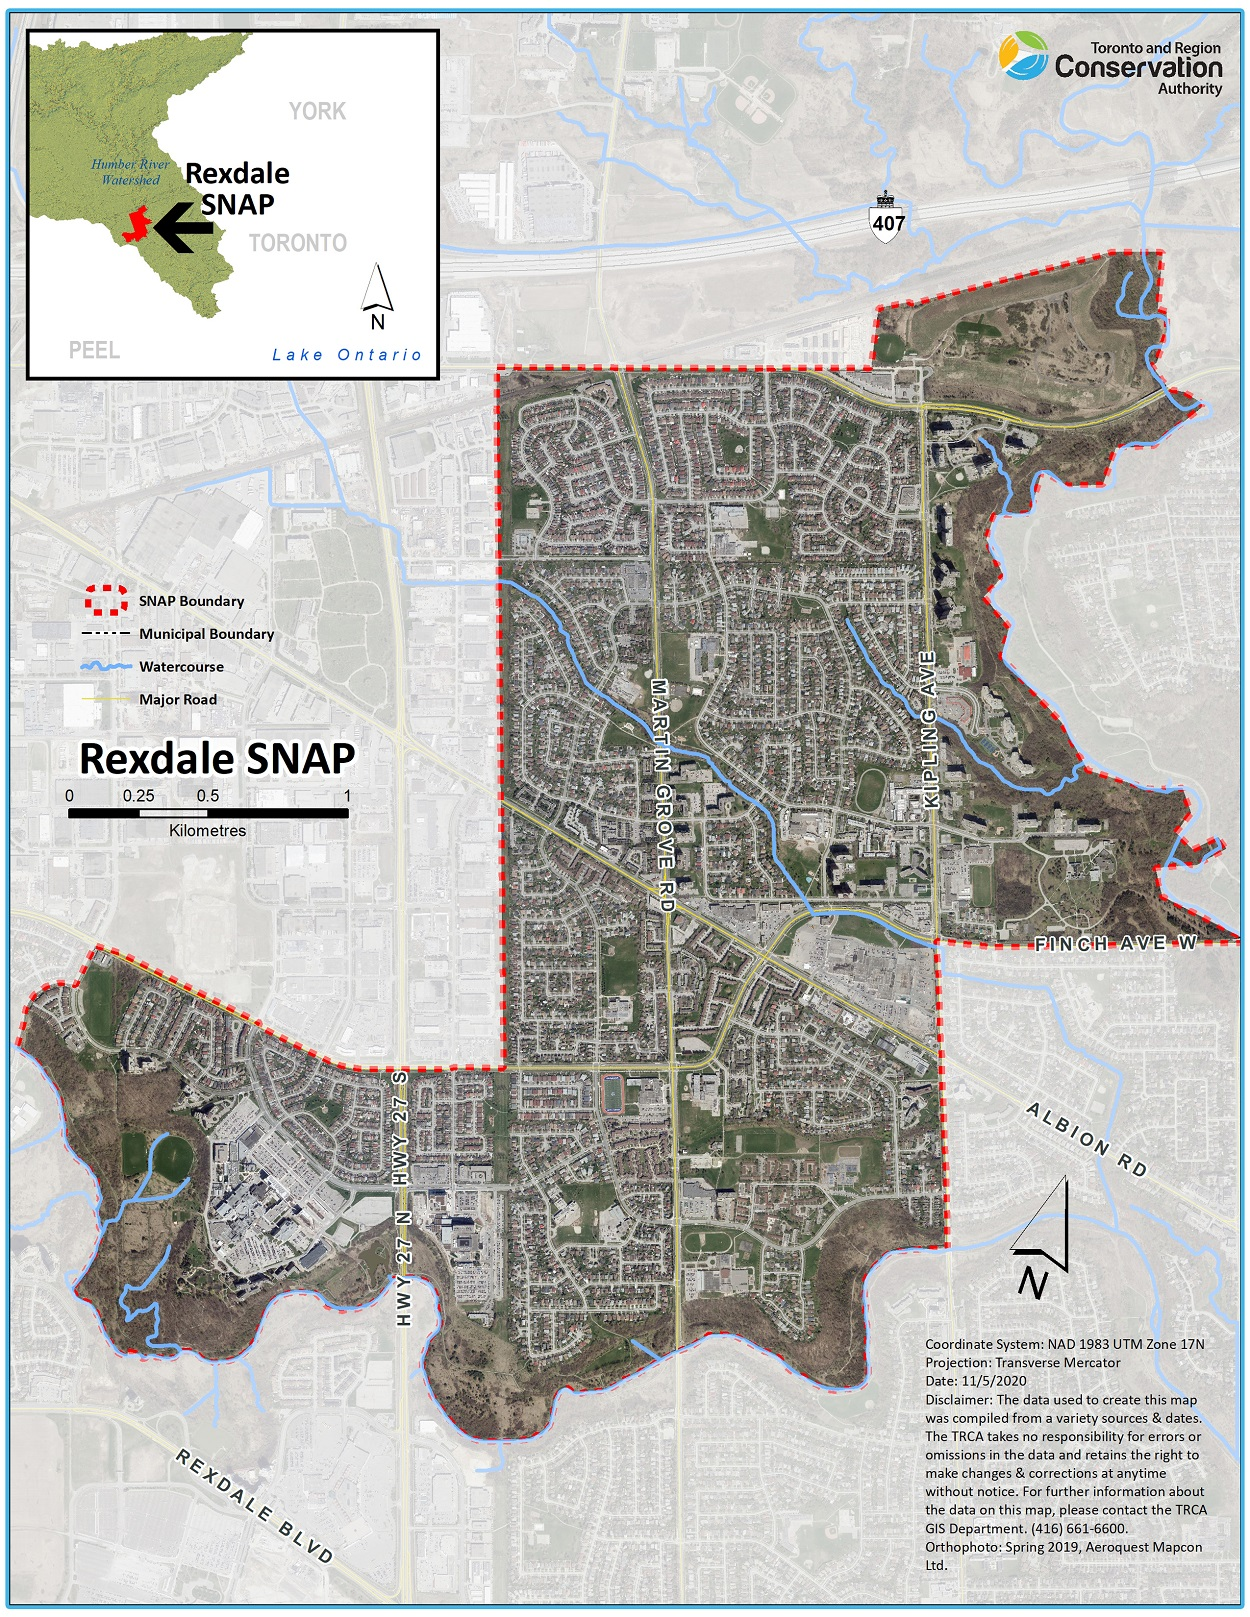 map of Rexdale SNAP area boundaries